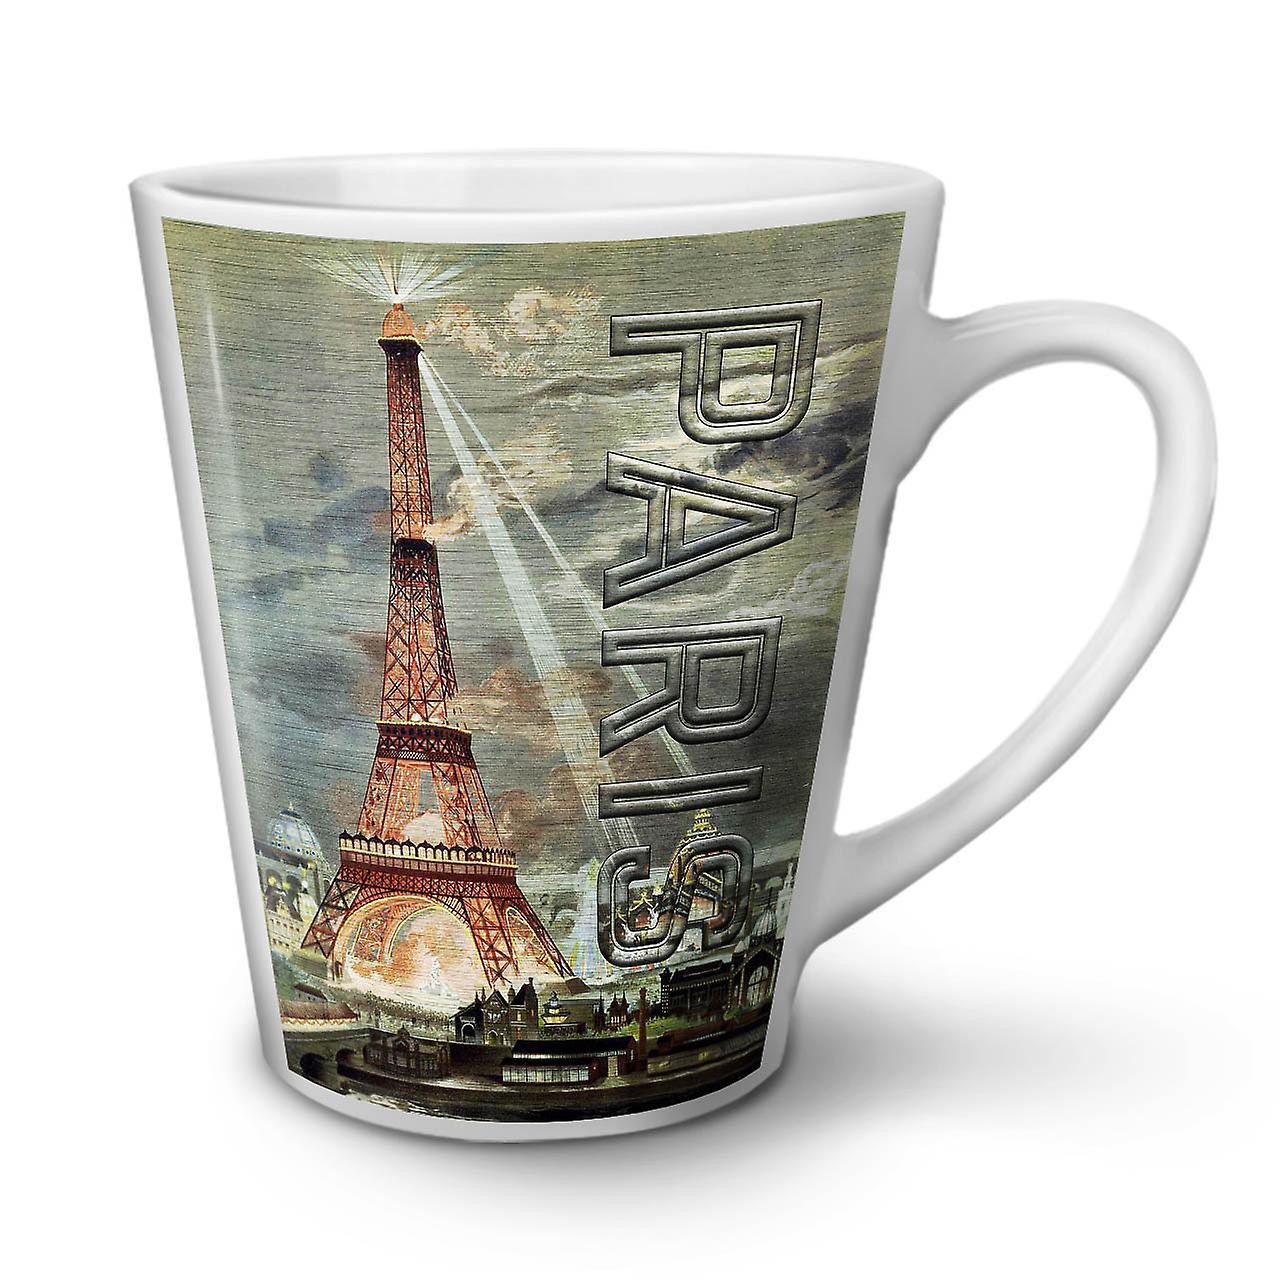 Mug OzWellcoda Light Landmark New Tea 12 White Urban Latte Ceramic Coffee rdxBWCeo